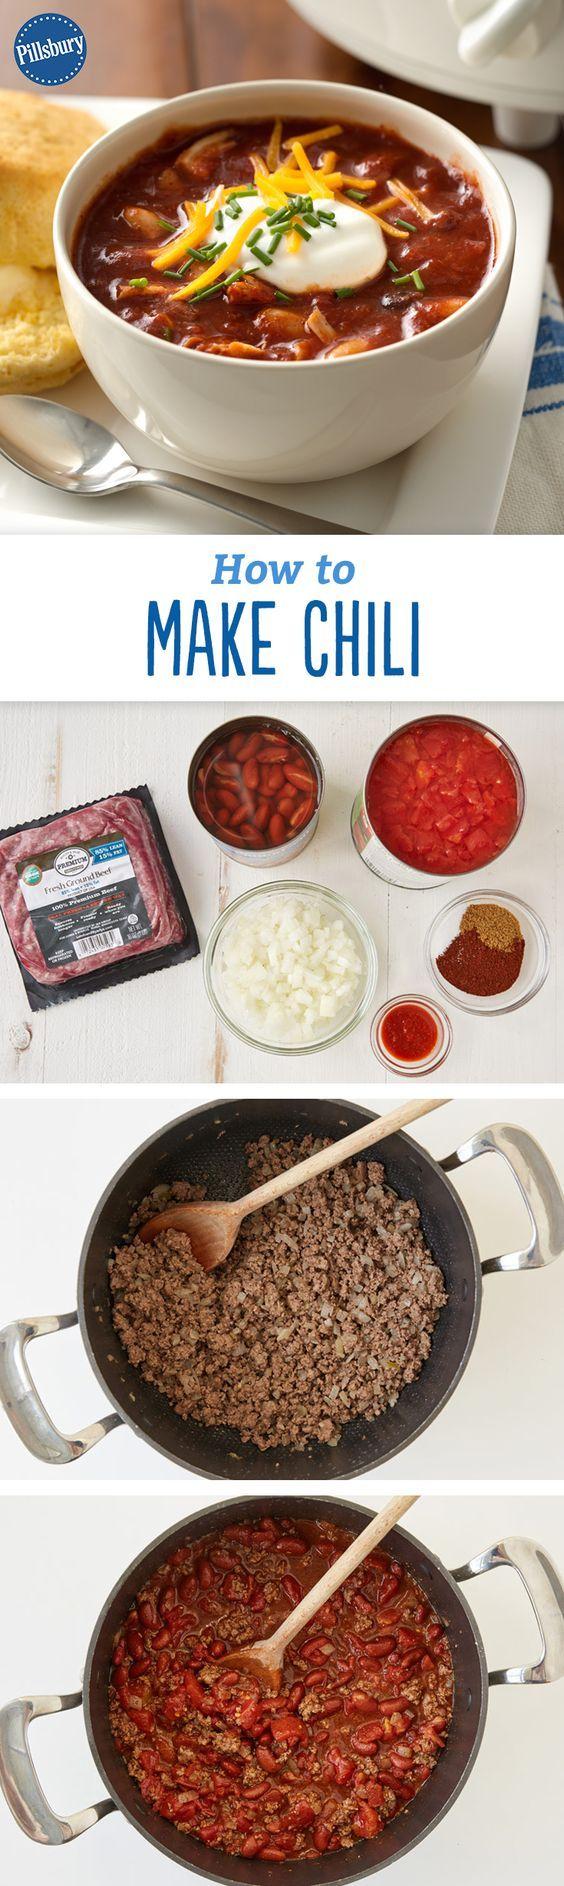 Chili Recipe chili recipes How to make chili, Chilli